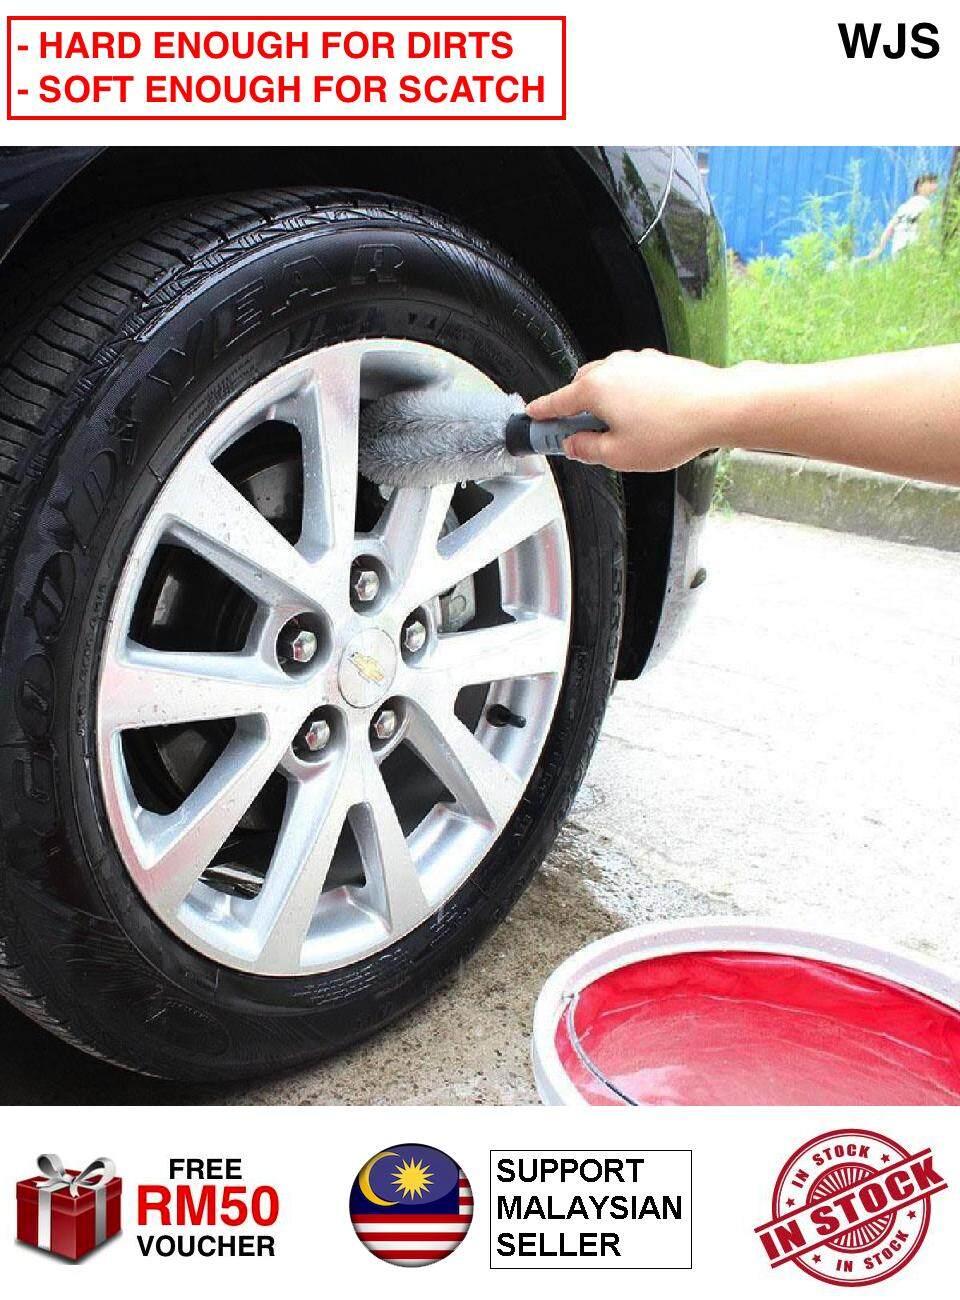 (WILL NOT SCRATCH YOUR DEAR RIM) WJS Car Motorcycle Tire Tyre Rim Cleaning Brush Scrubbing Washing Dirt Cleaner Car Brush Car Tyre Brush Rim Brush Berus Tayar Berus Rim Berus Kereta BLACK GREY [FREE RM 50 VOUCHER]